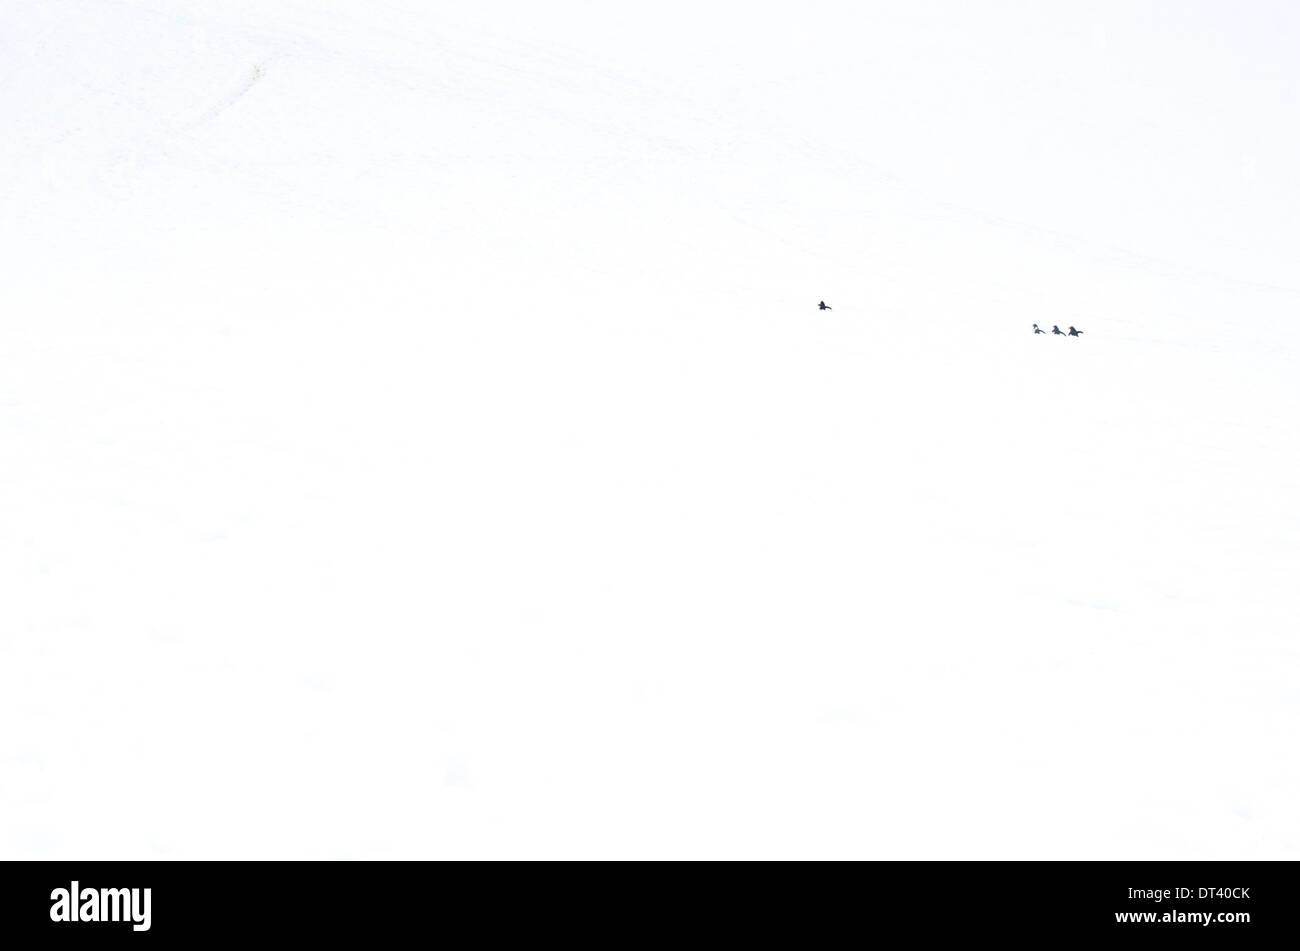 A minimalist image, with Chinstrap Penguins (Pygoscelis antarctica) in a huge white monotone landscape, its Antarctic habitat. - Stock Image